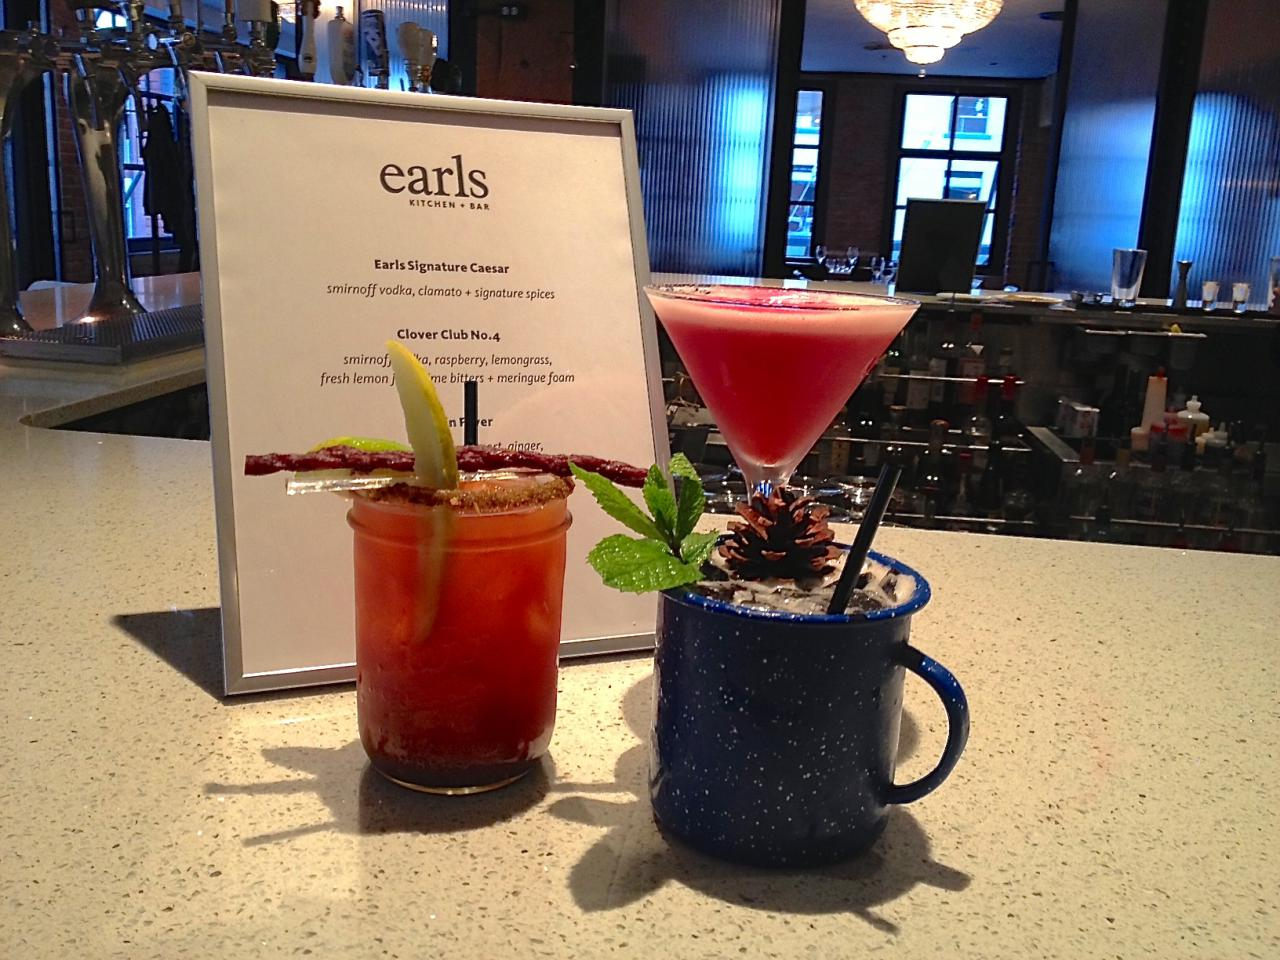 Signature Caesar cocktail at Earl's Restaurant